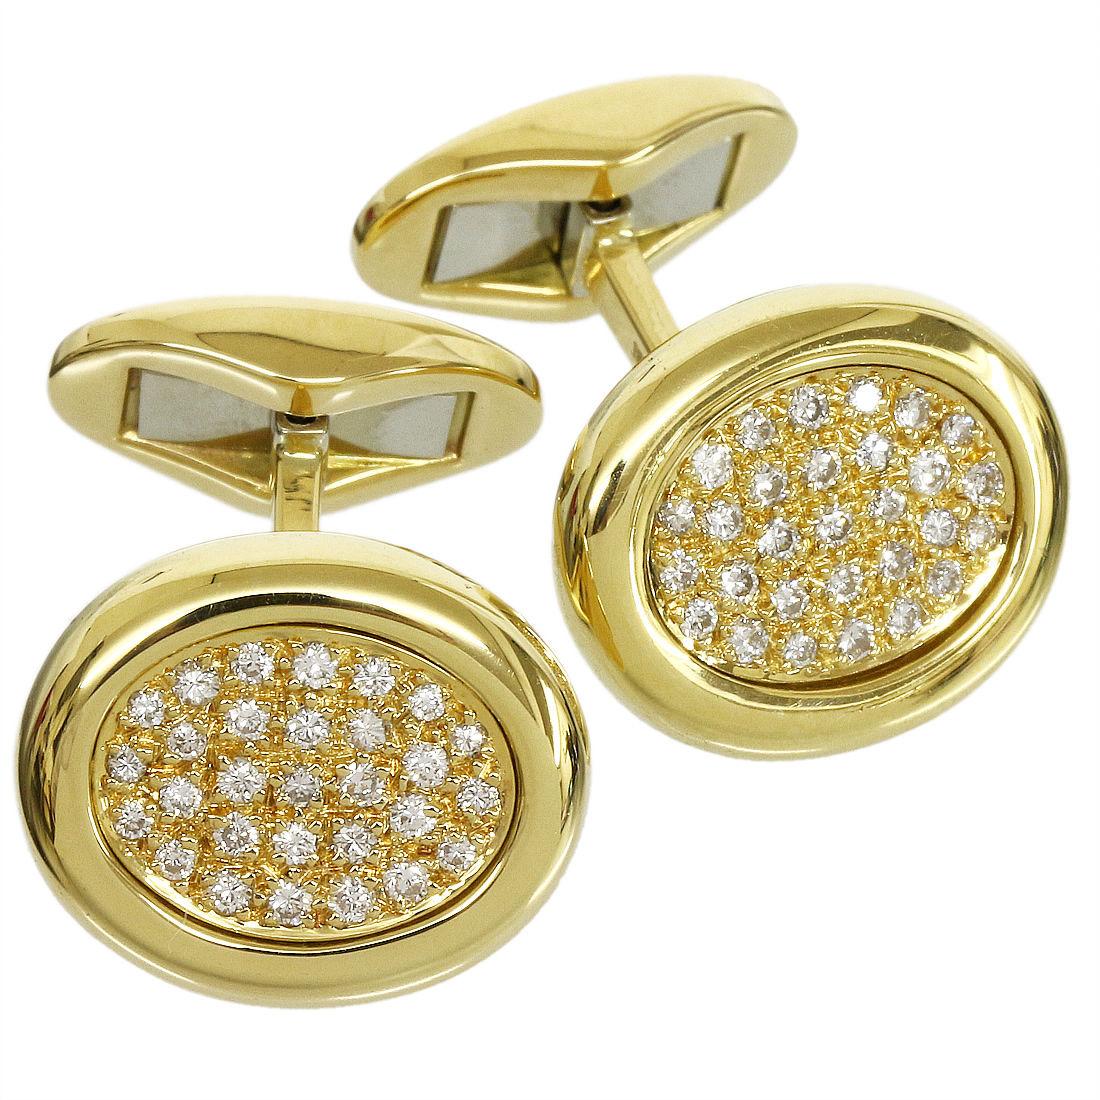 "Image of ""Piaget 18K Yellow Gold Diamonds Cufflinks"""